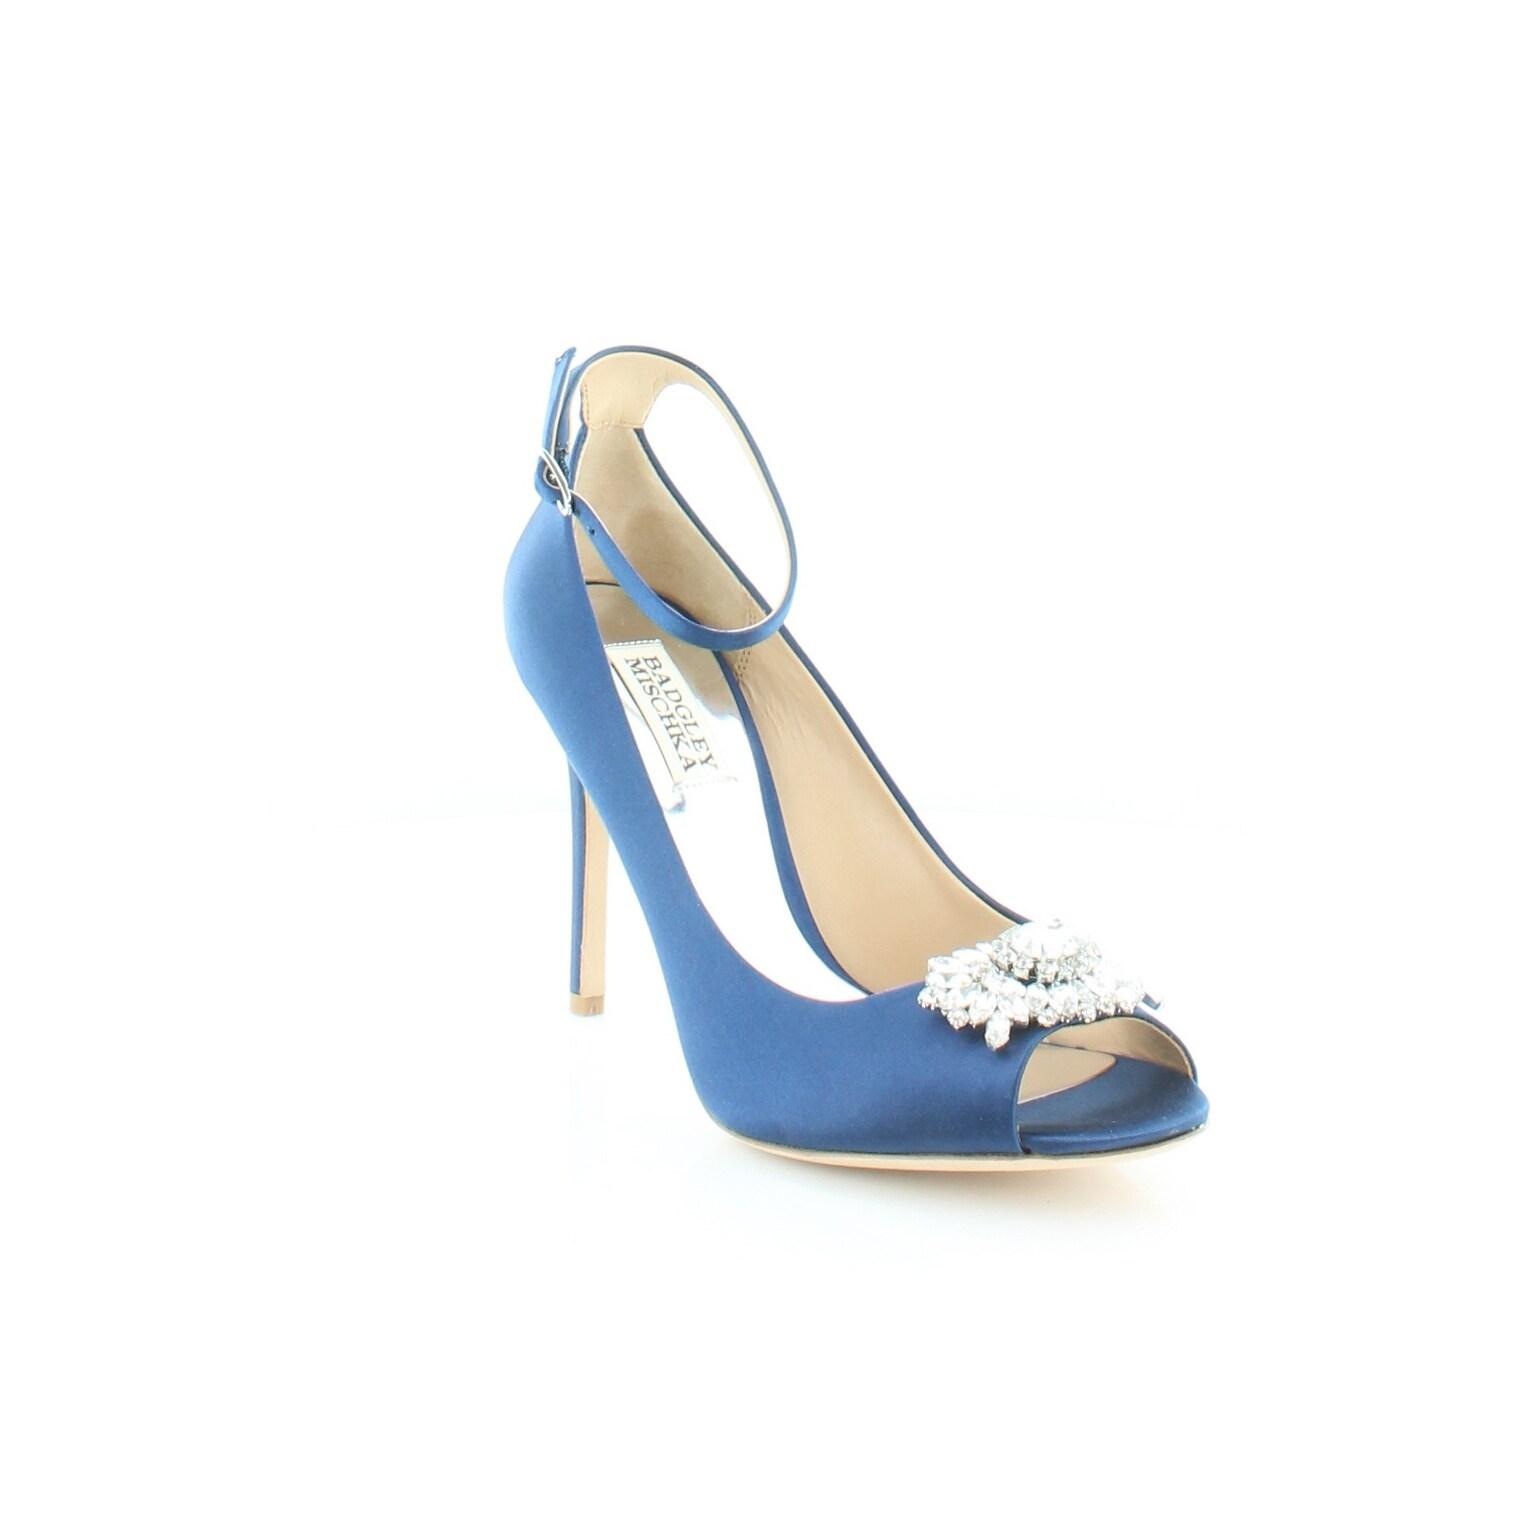 223a4643ea6 Shop Badgley Mischka Kali Women s Heels Navy - Free Shipping Today -  Overstock - 21690266